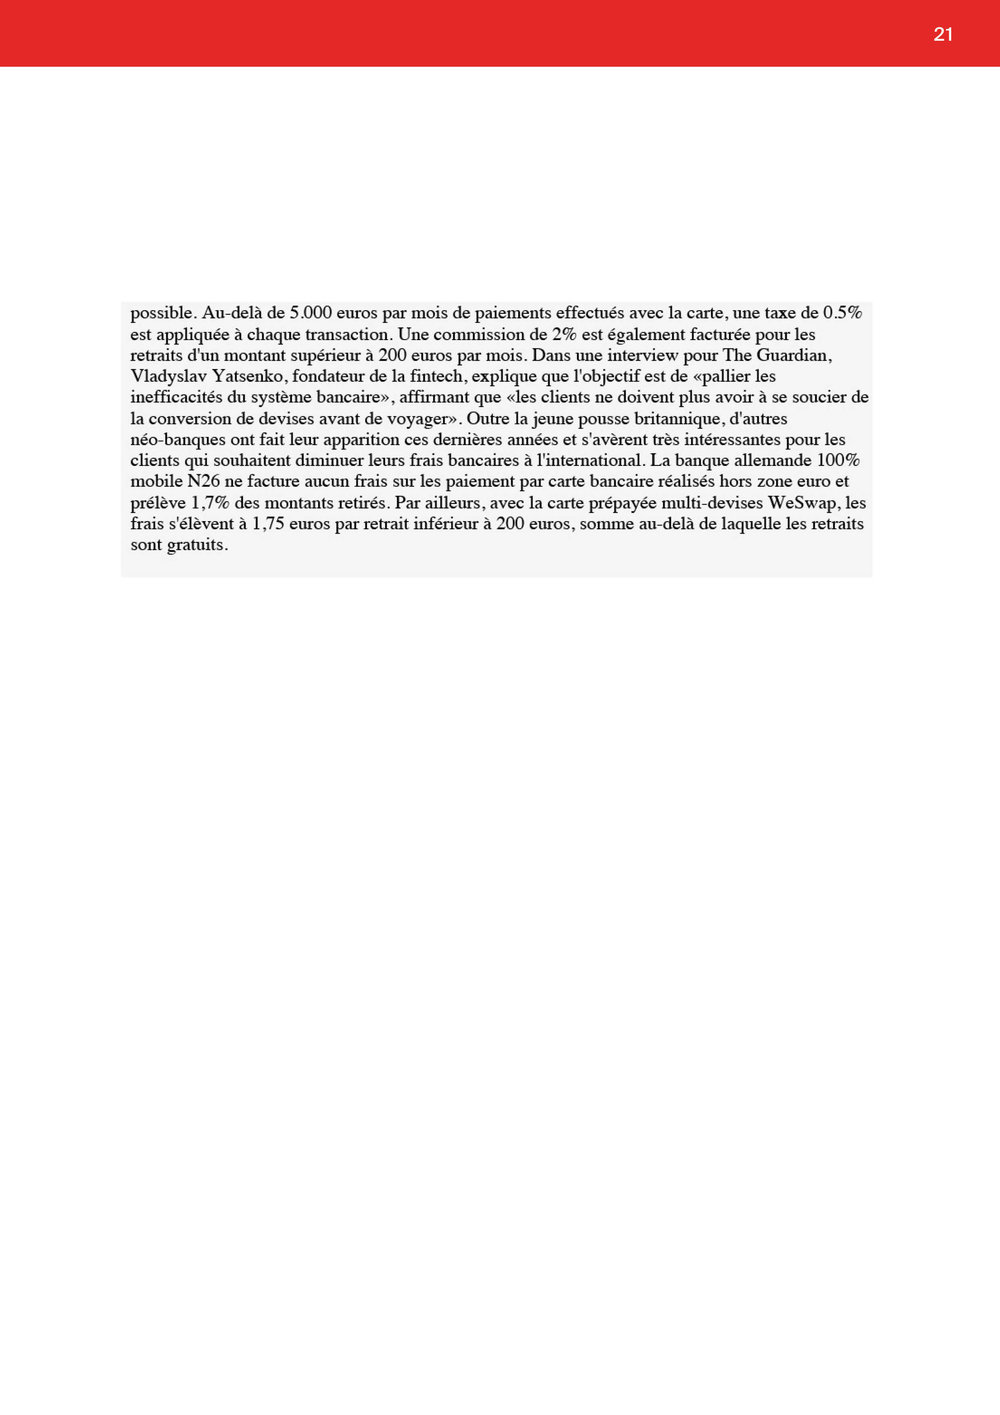 BOOKMEDIA_JUILLET_021.jpg